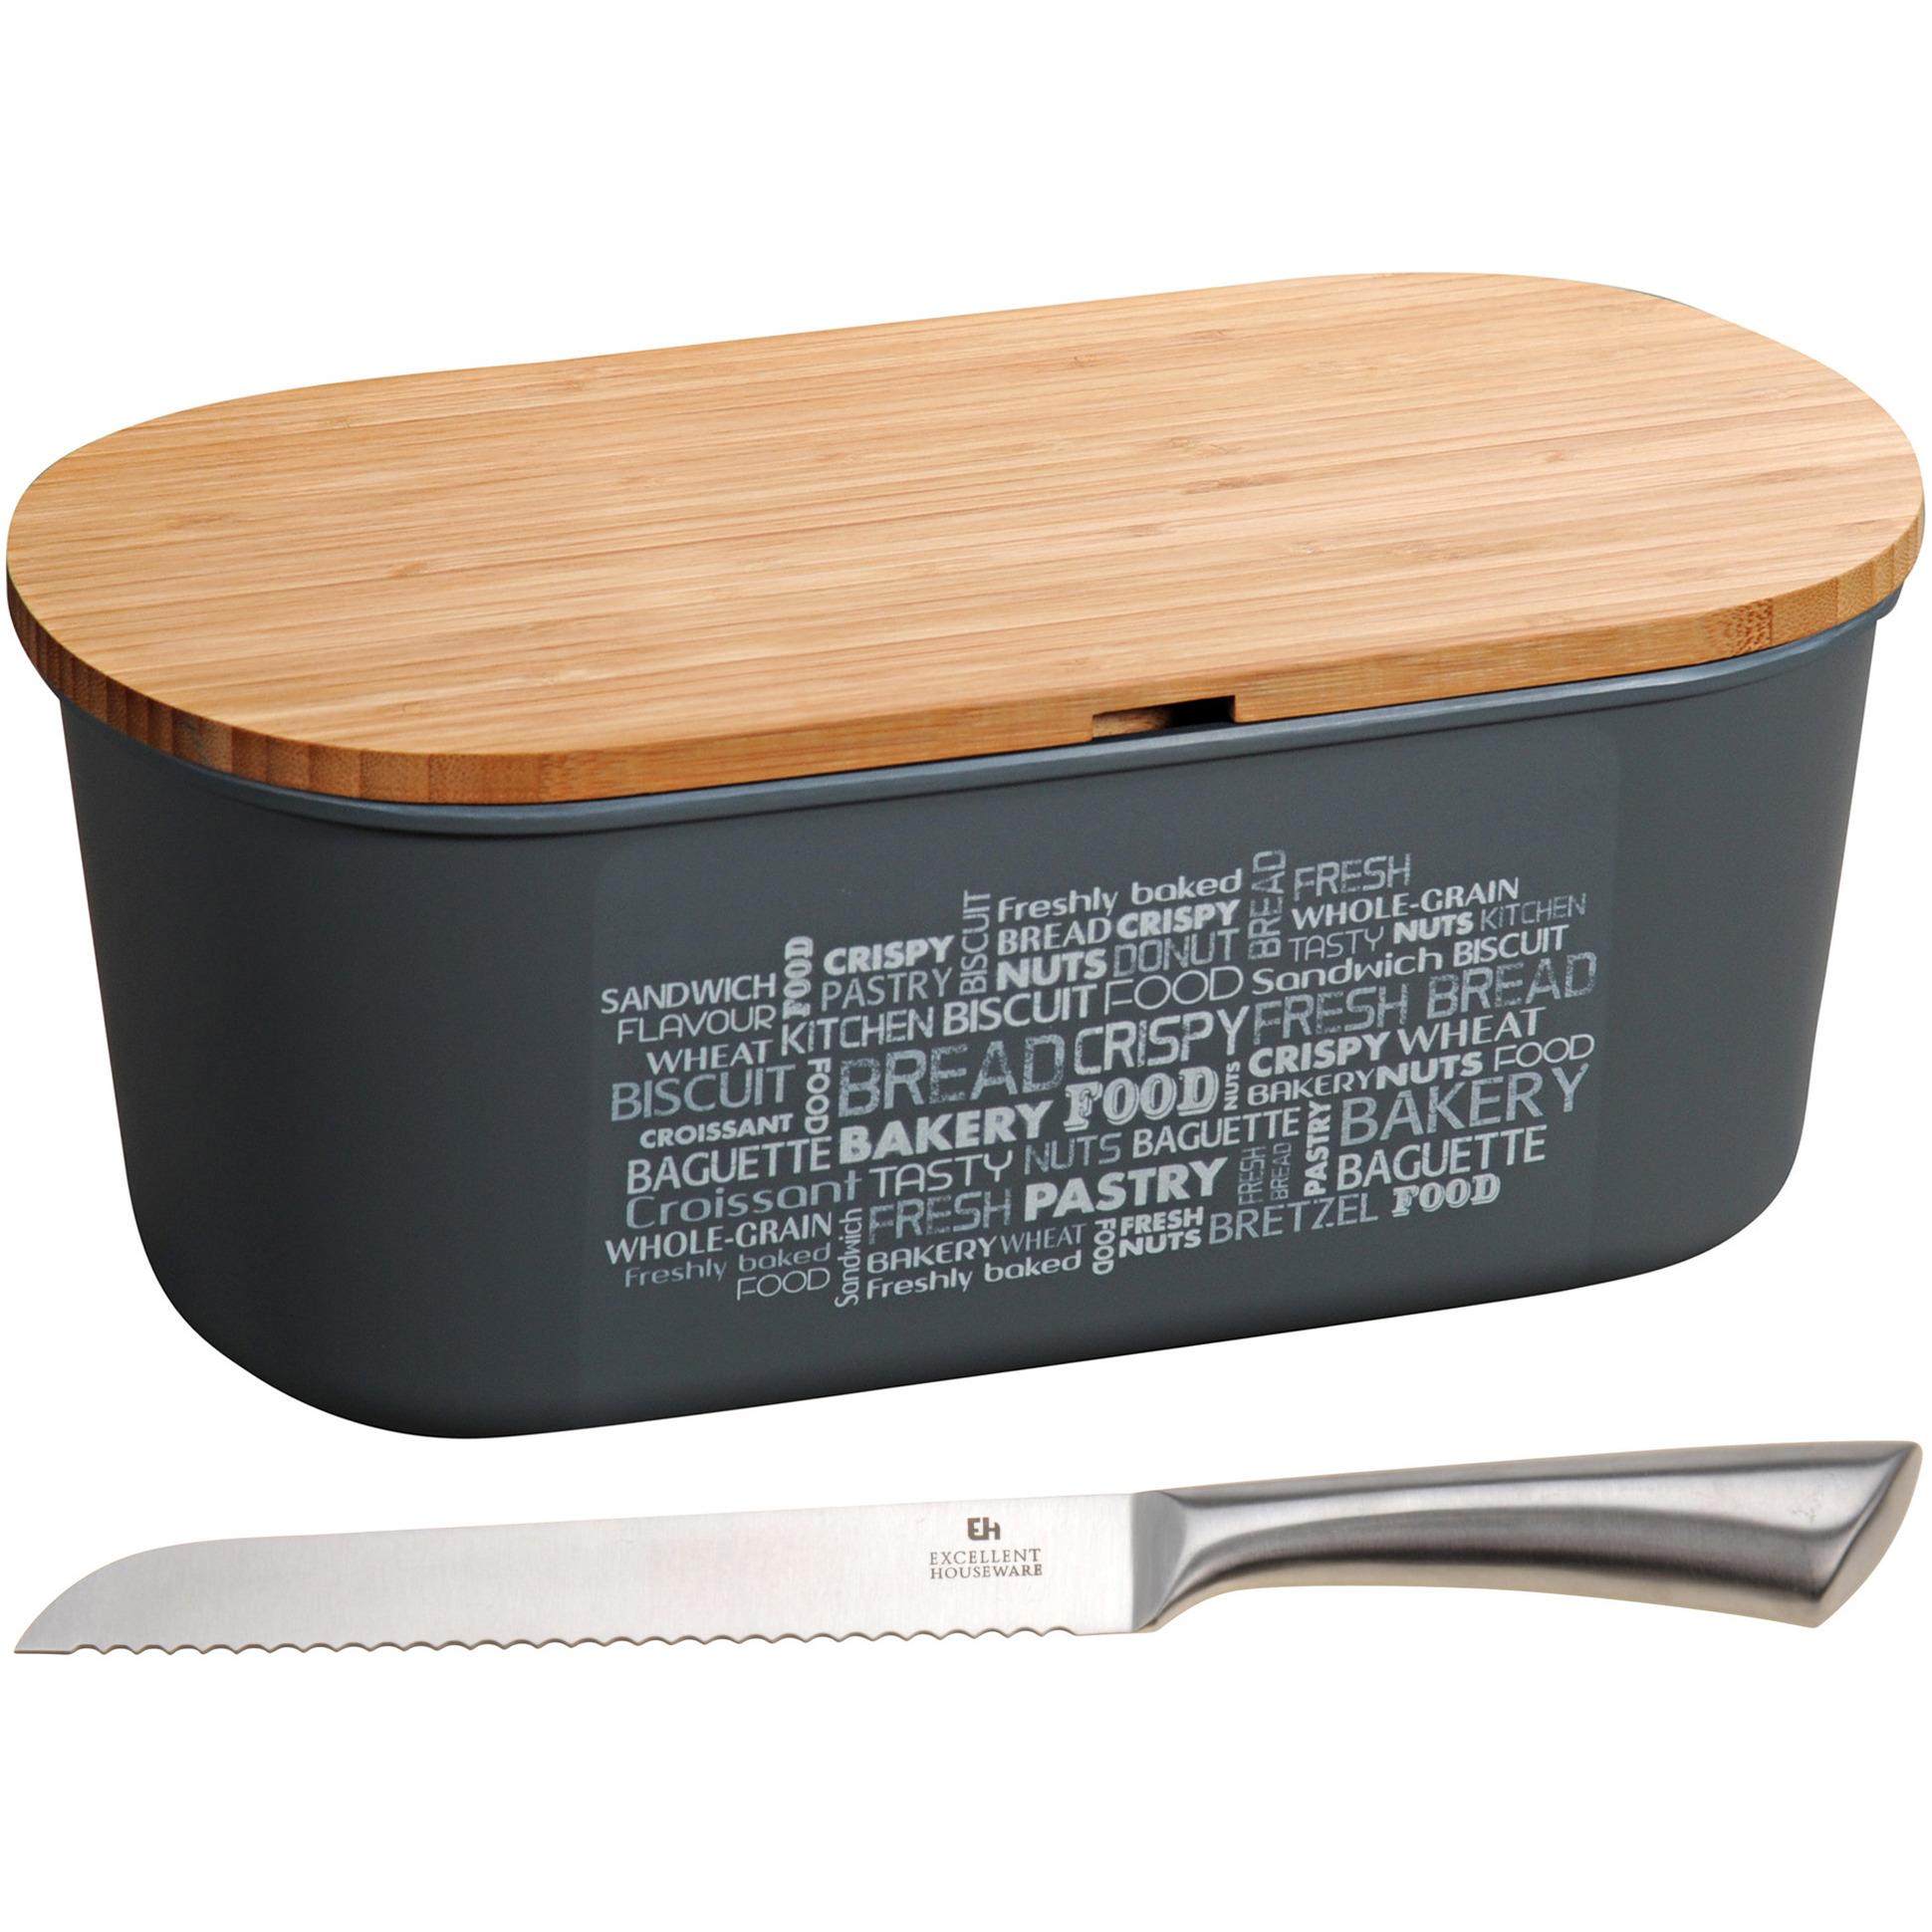 Grijze broodtrommel met snijplank deksel en RVS broodmes 18 x 34 x 14 cm